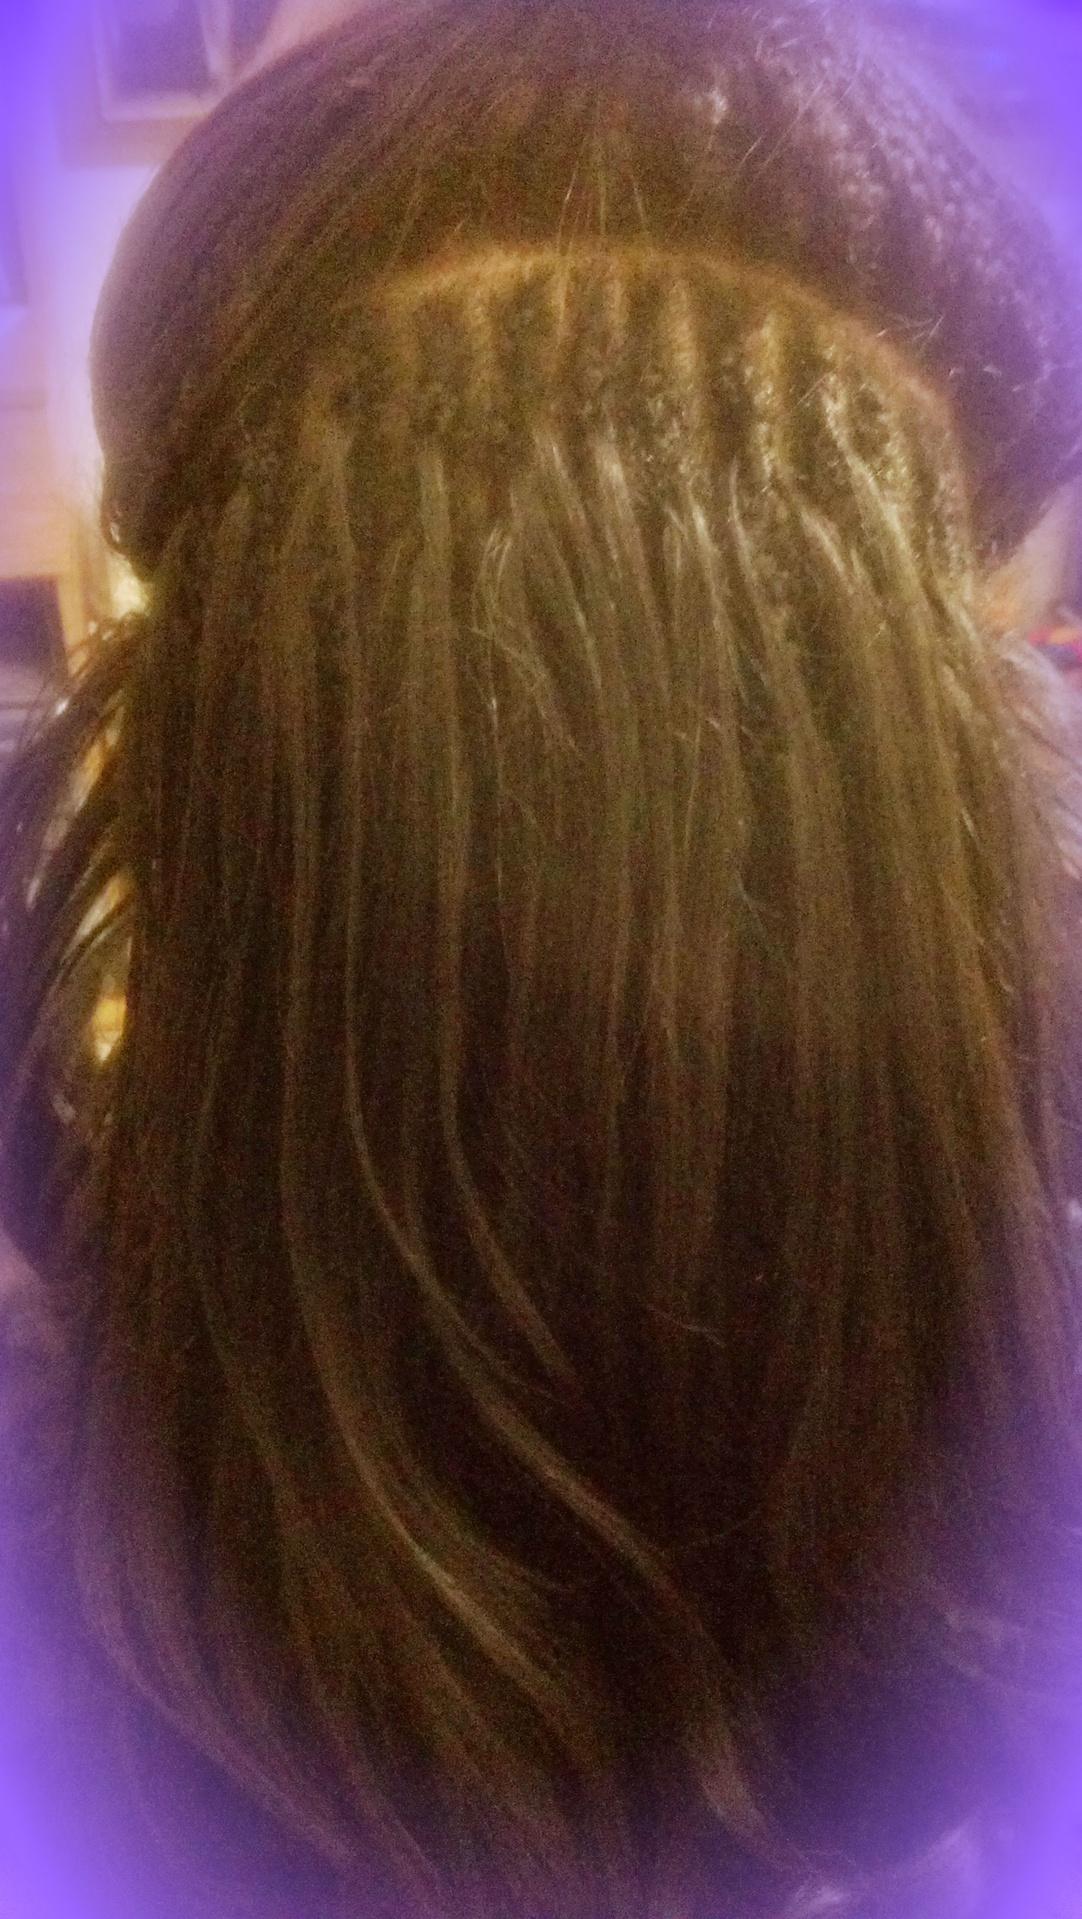 Two Layer regTree Braid with 100% human hair and crochet braid edge